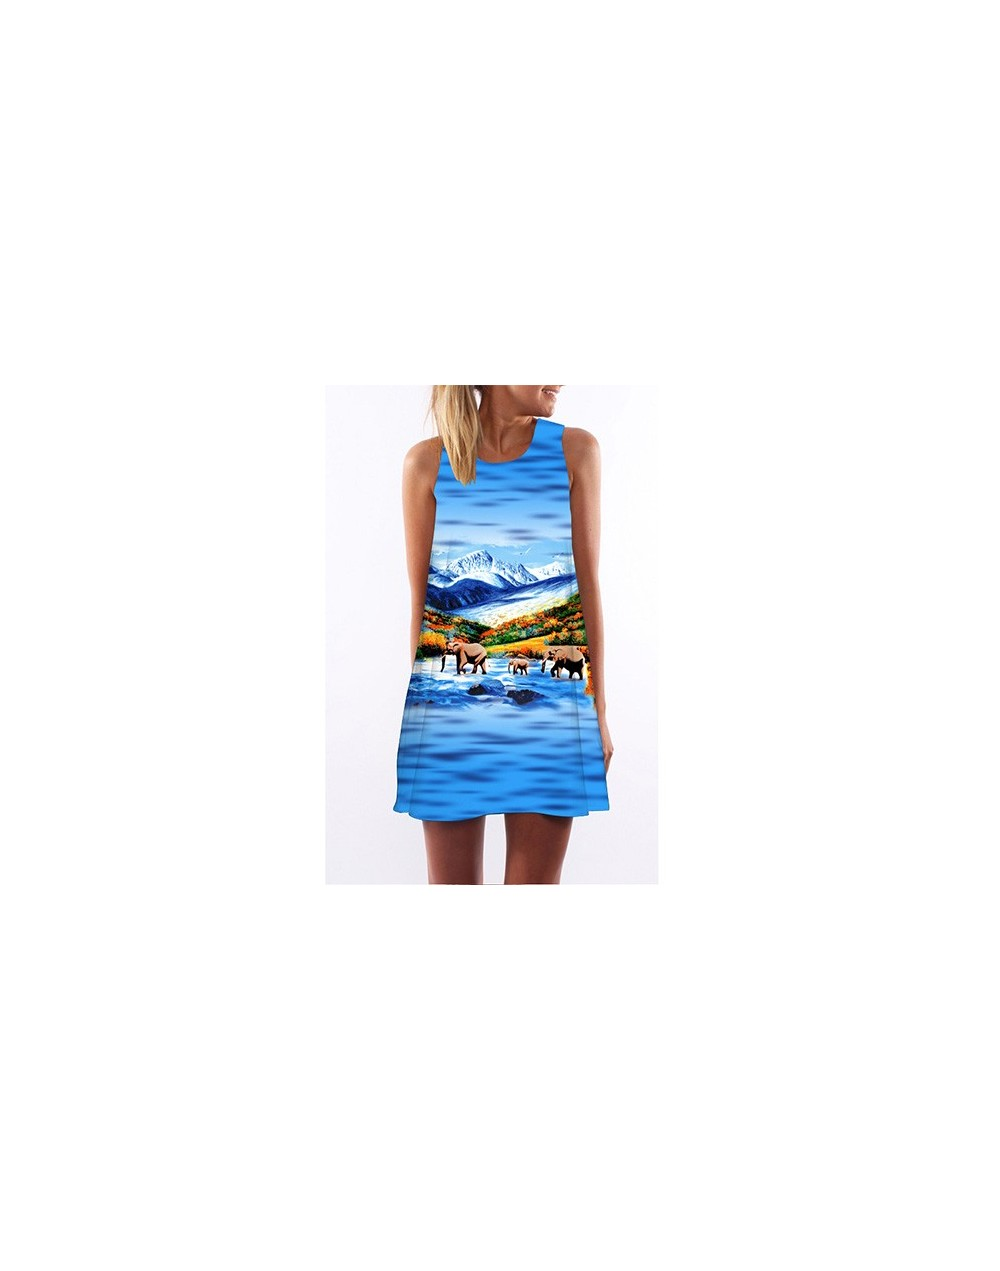 Vestidos 2018 New Fashion Dress Women Sleeveless Floral Print Dress Summer Style Casual Chiffon Dress Mini Shift Dress - pic...